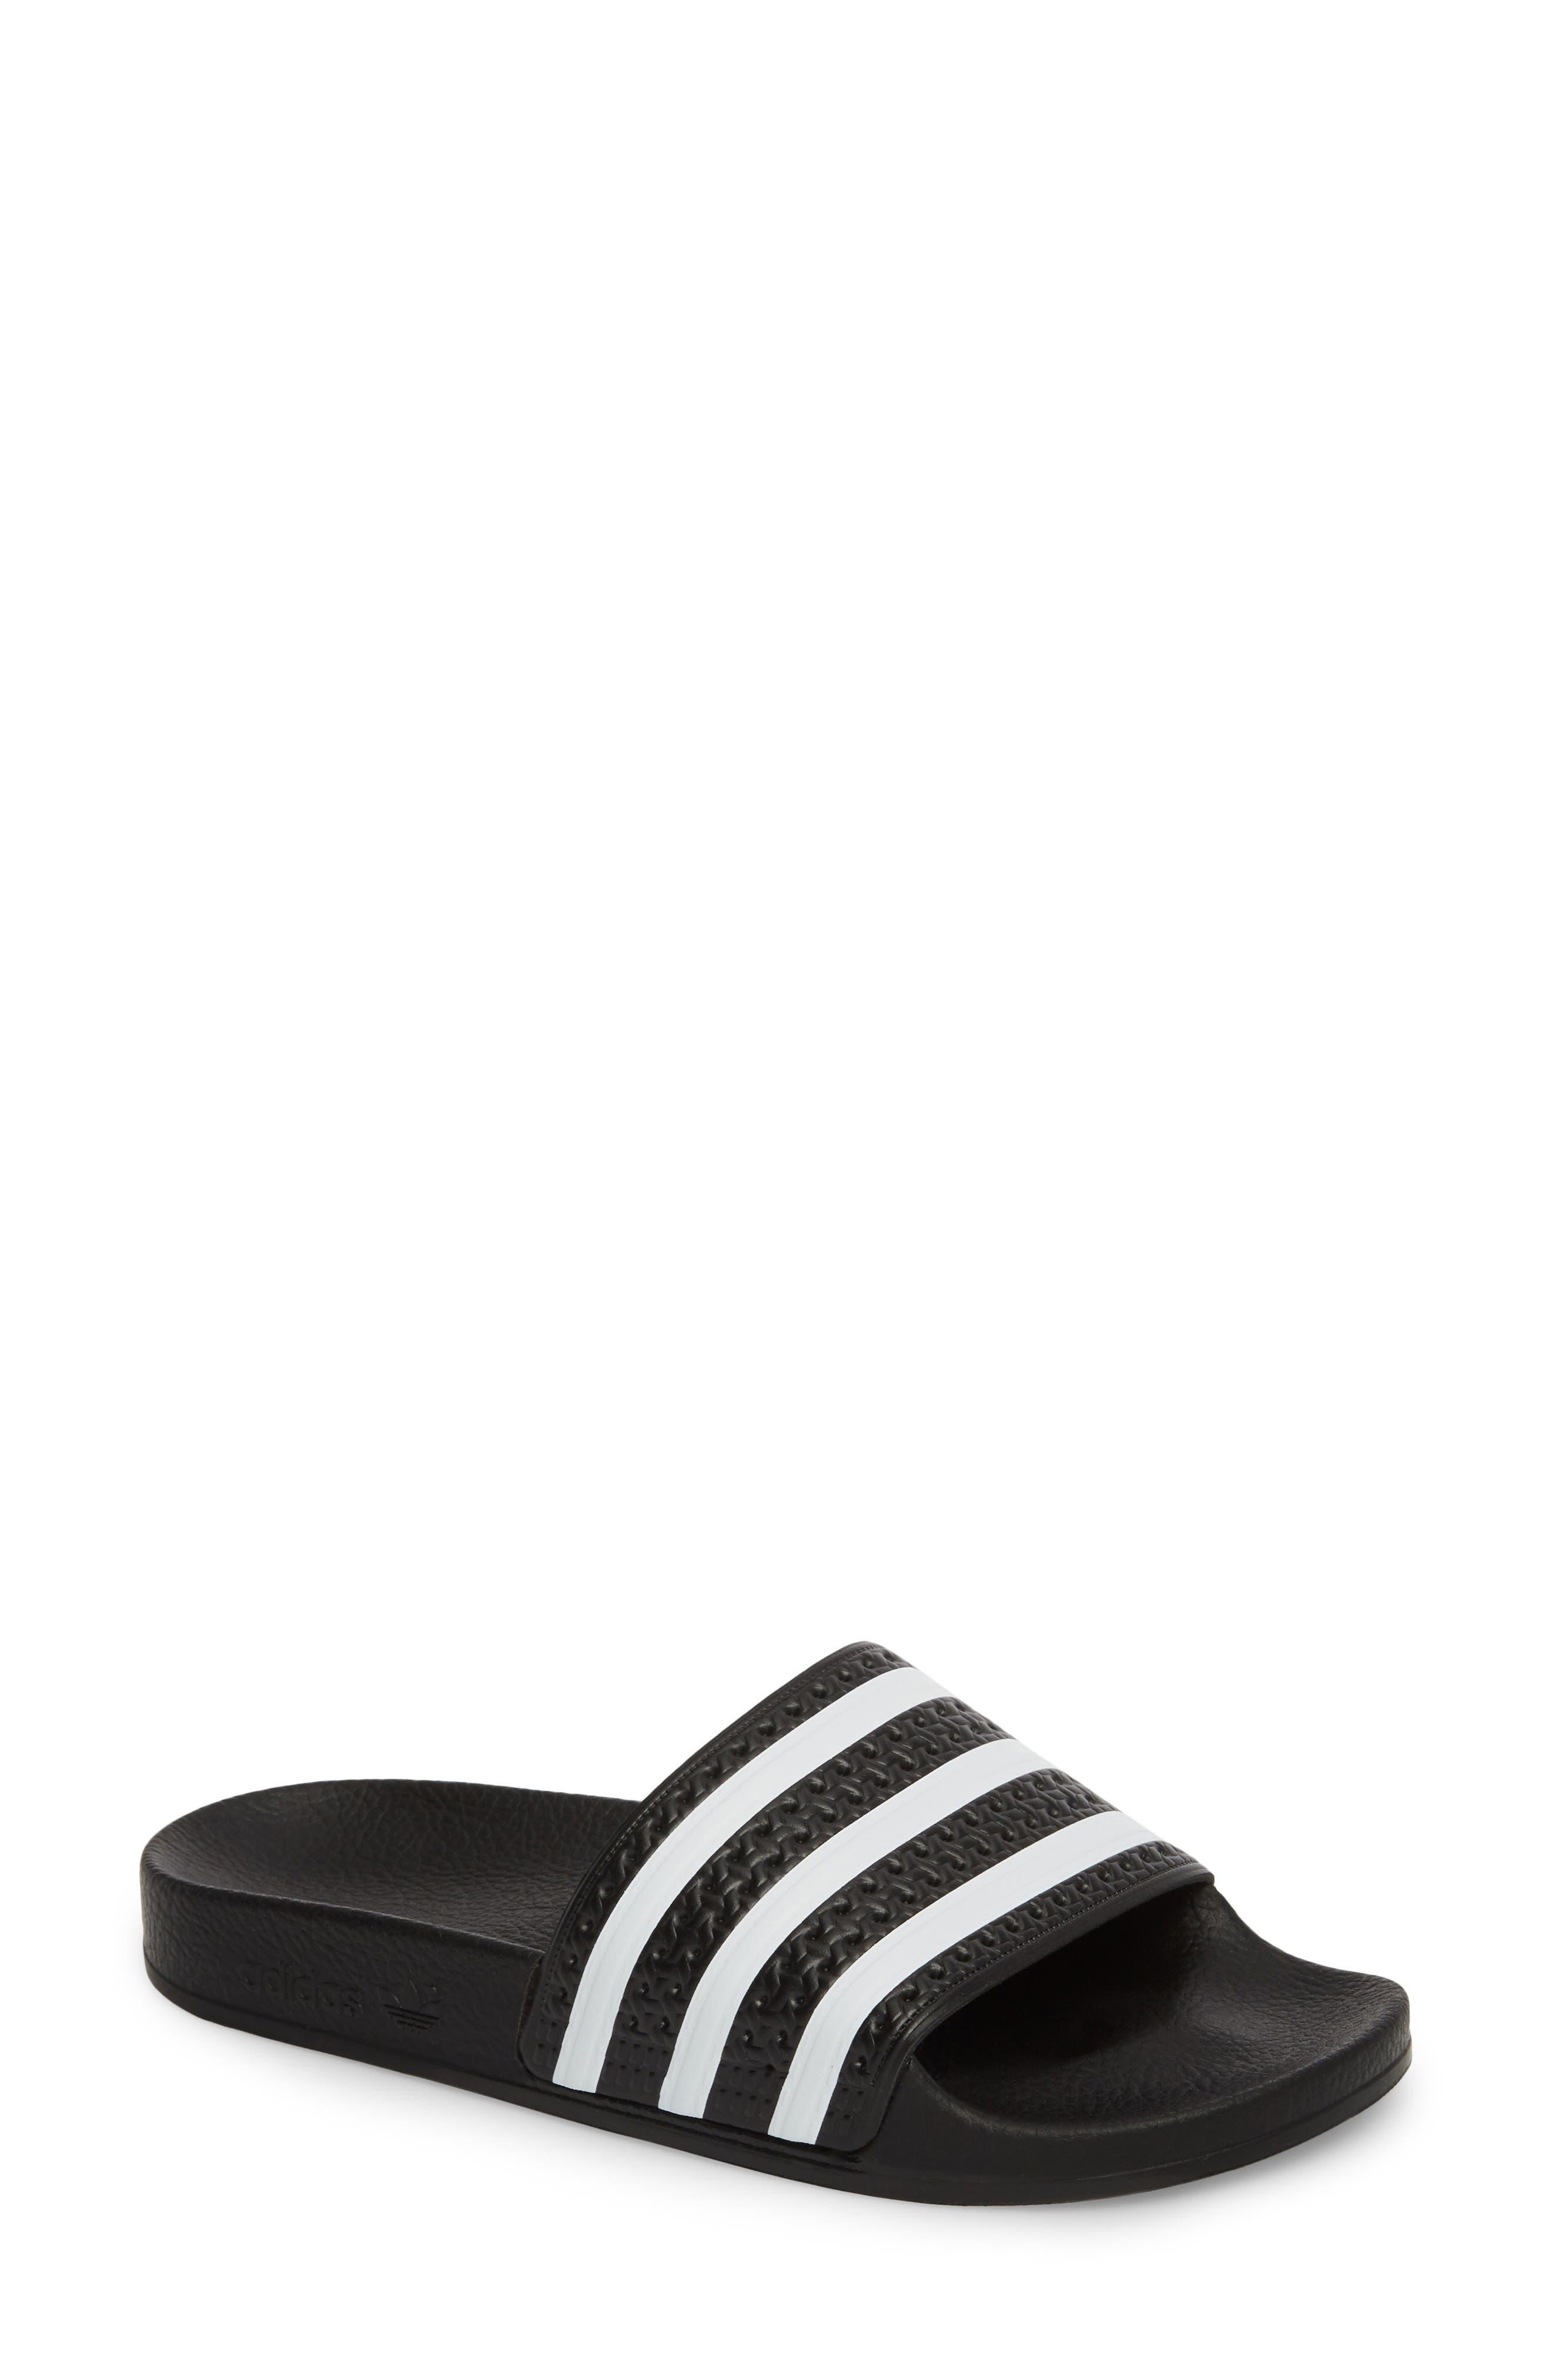 6e2ed2d2f54f63 adidas Sandals - Women s